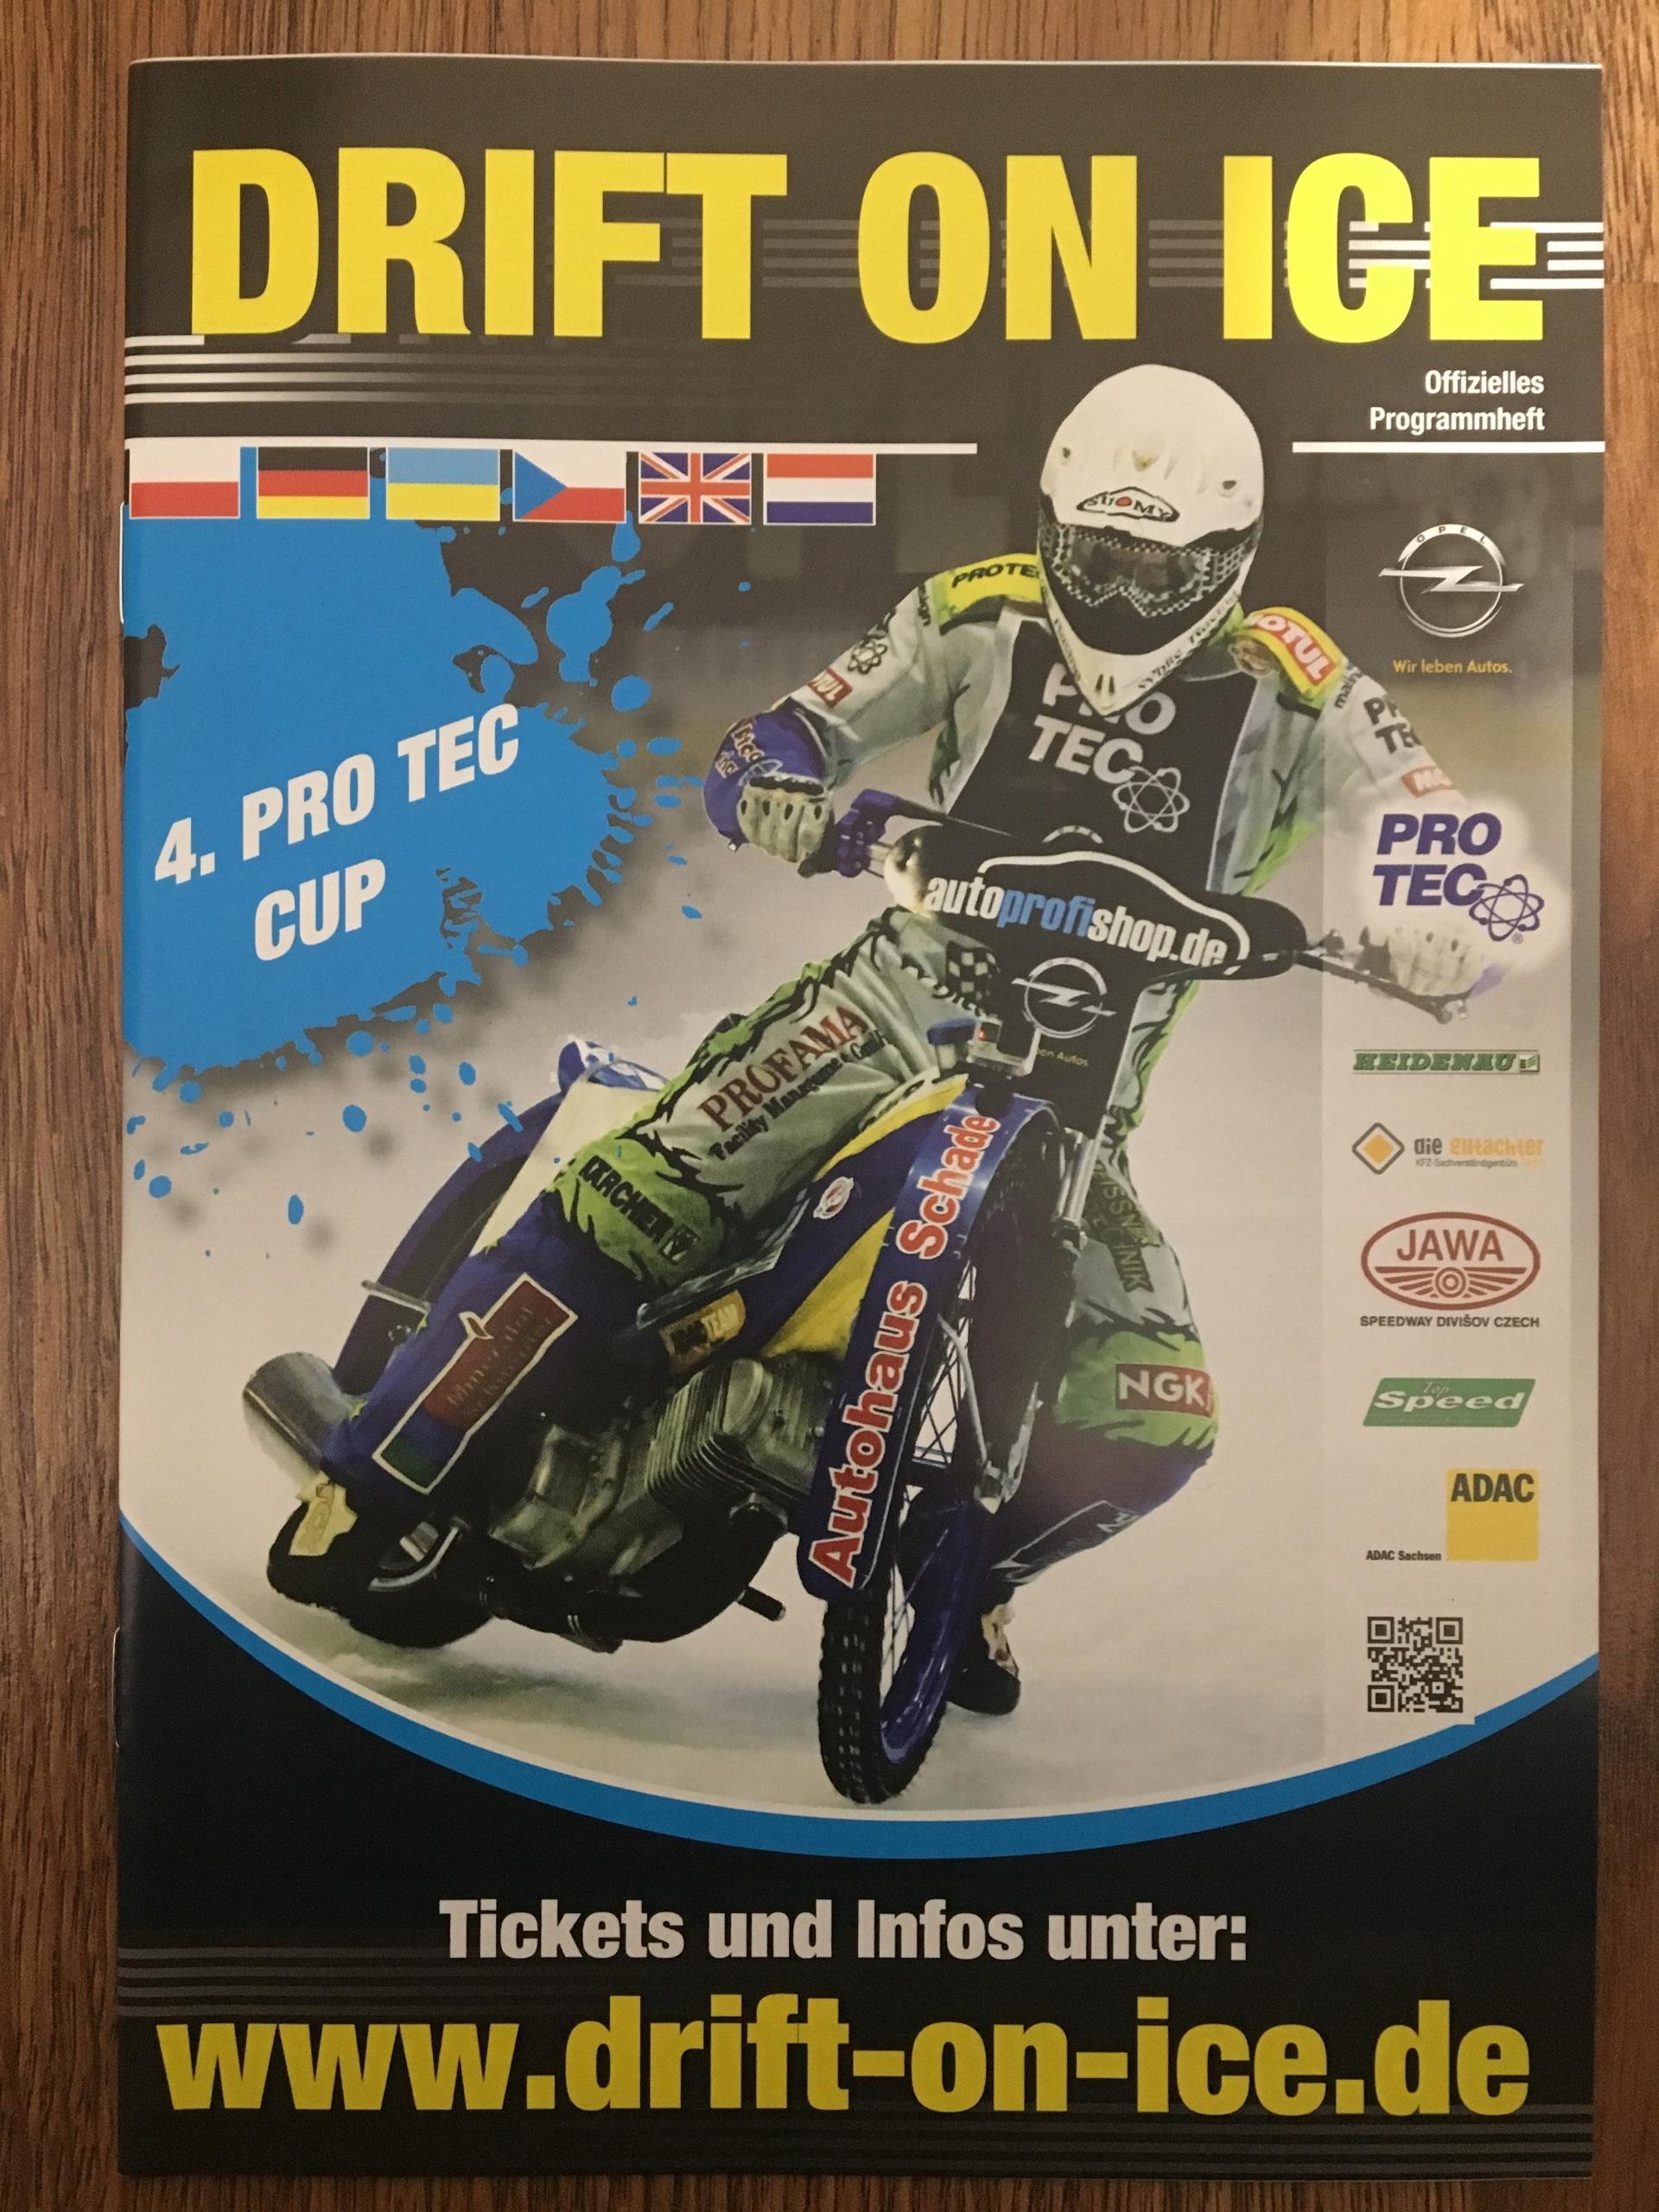 4. Drift on Ice Pro Tec Cup Jonsdorf 10.01.16